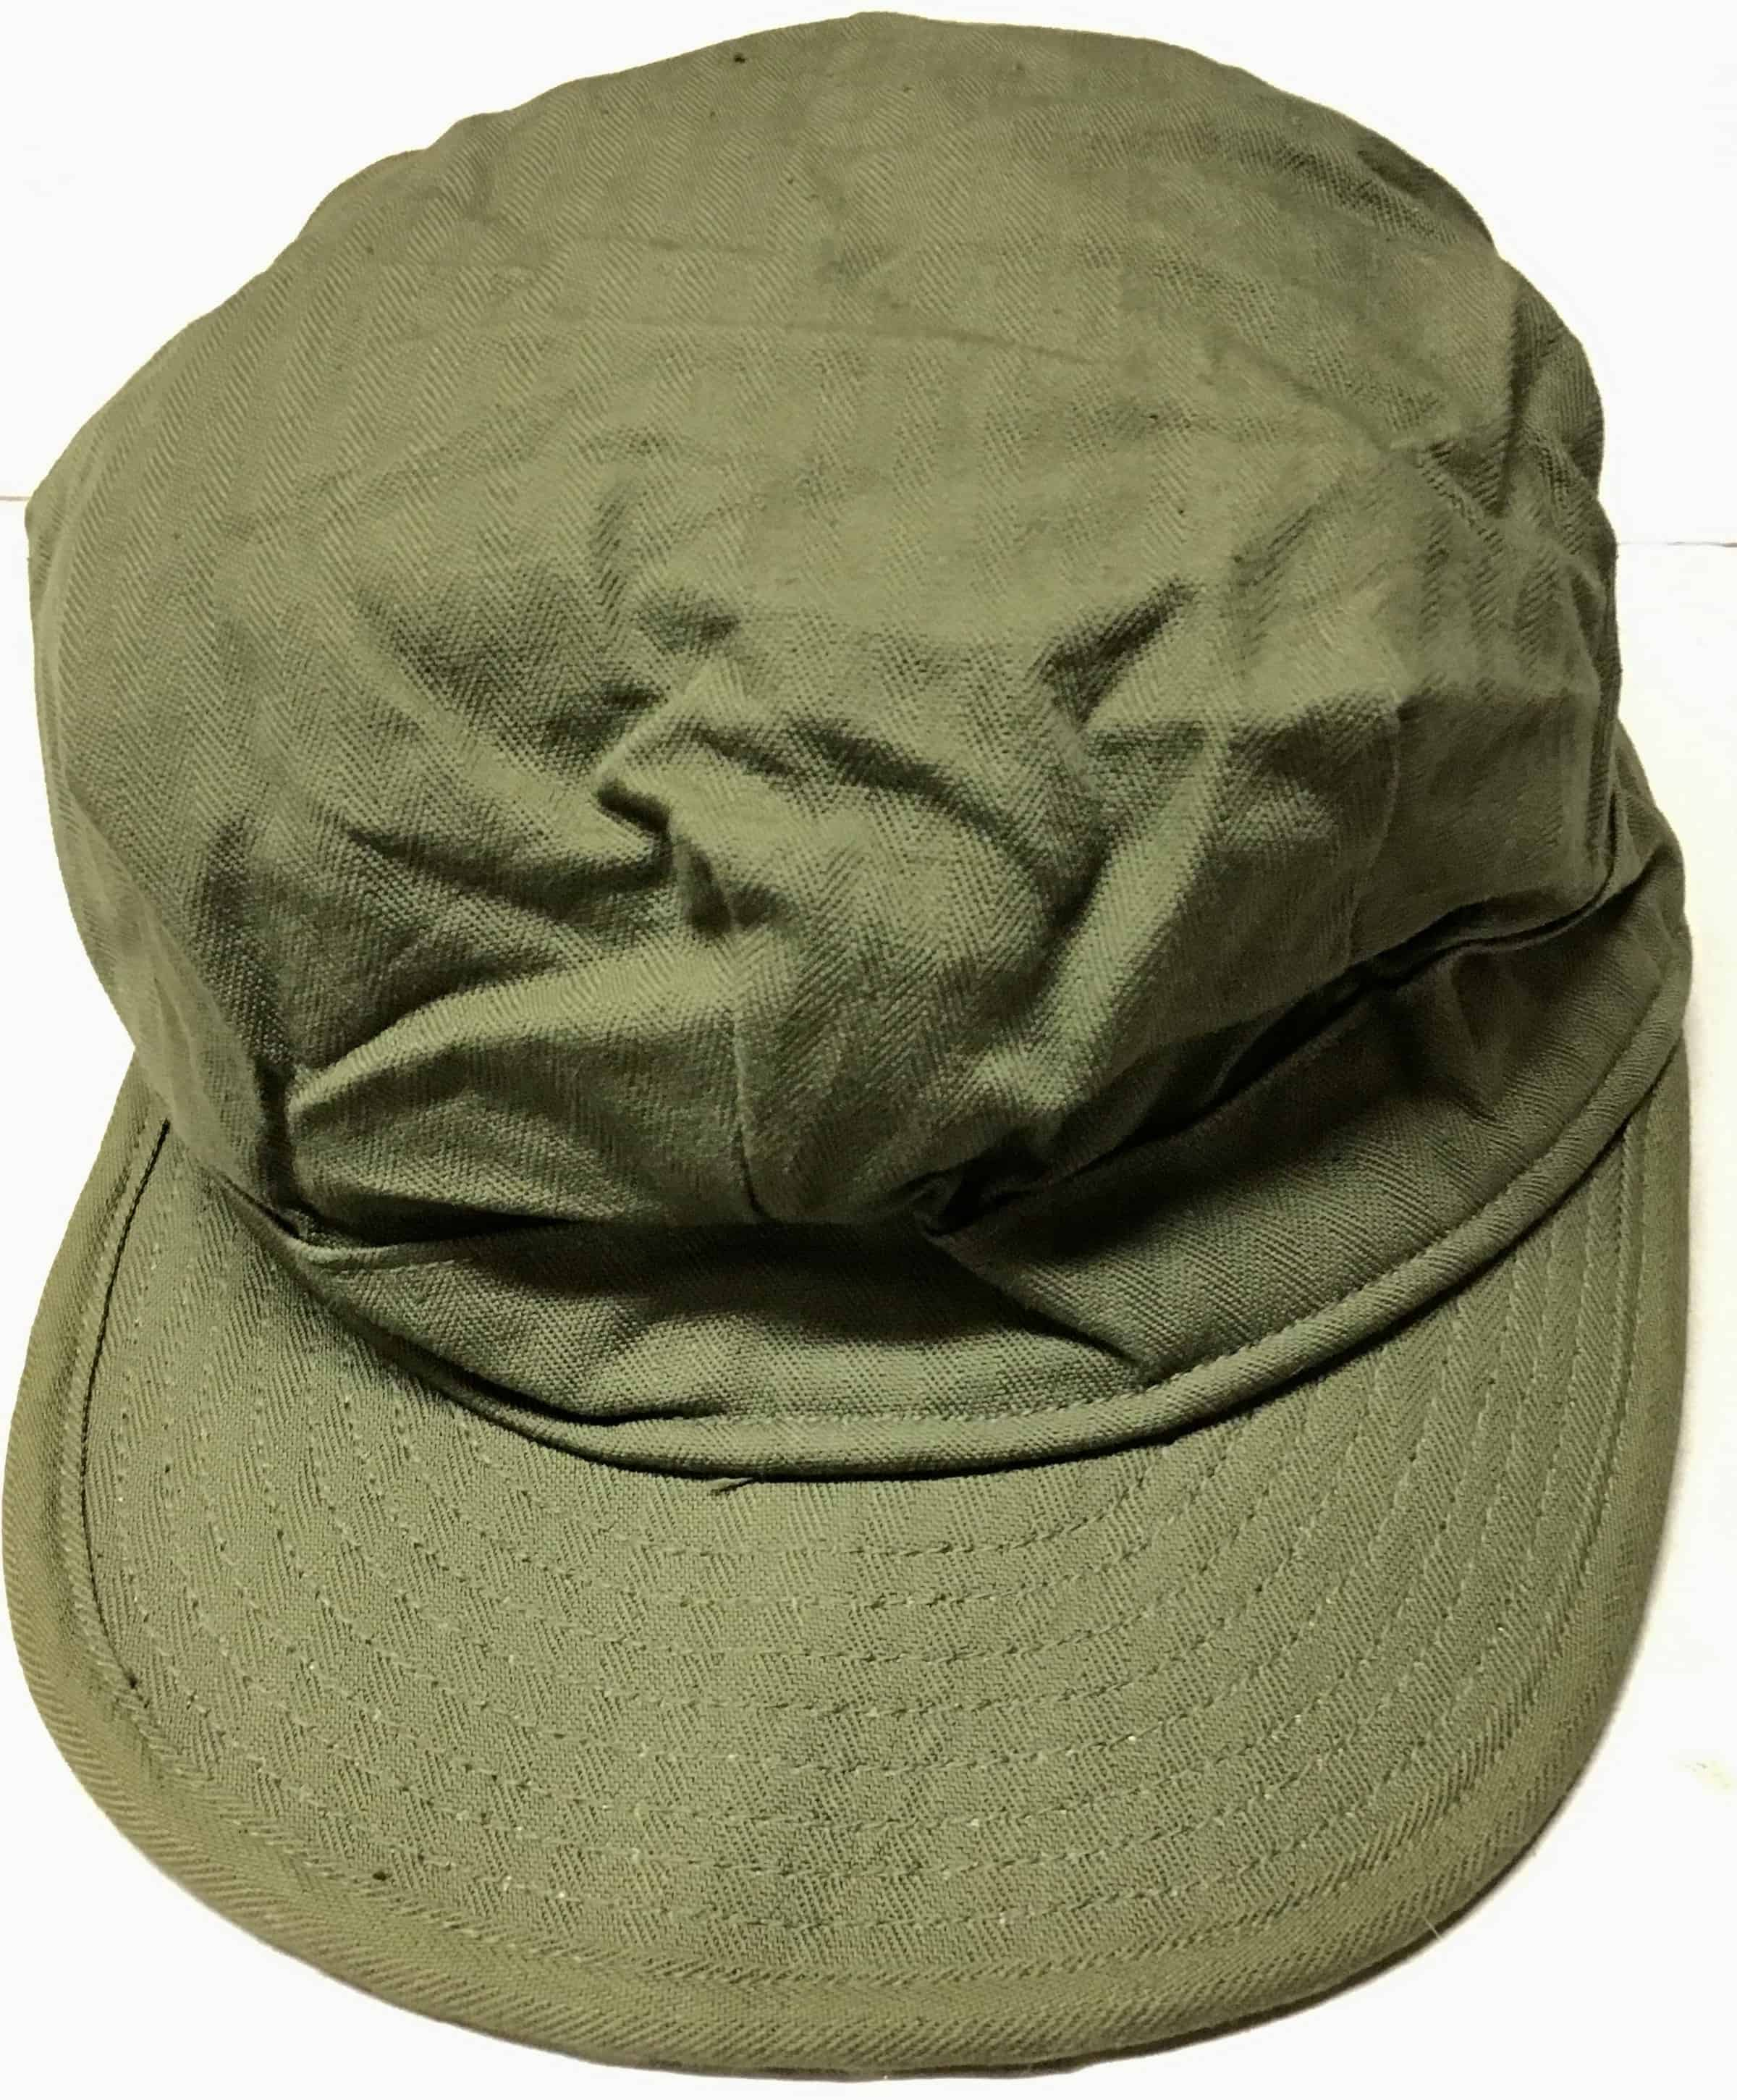 US Army Korean War HBT Field Cap - Enemy Militaria e4d2b8c4717f